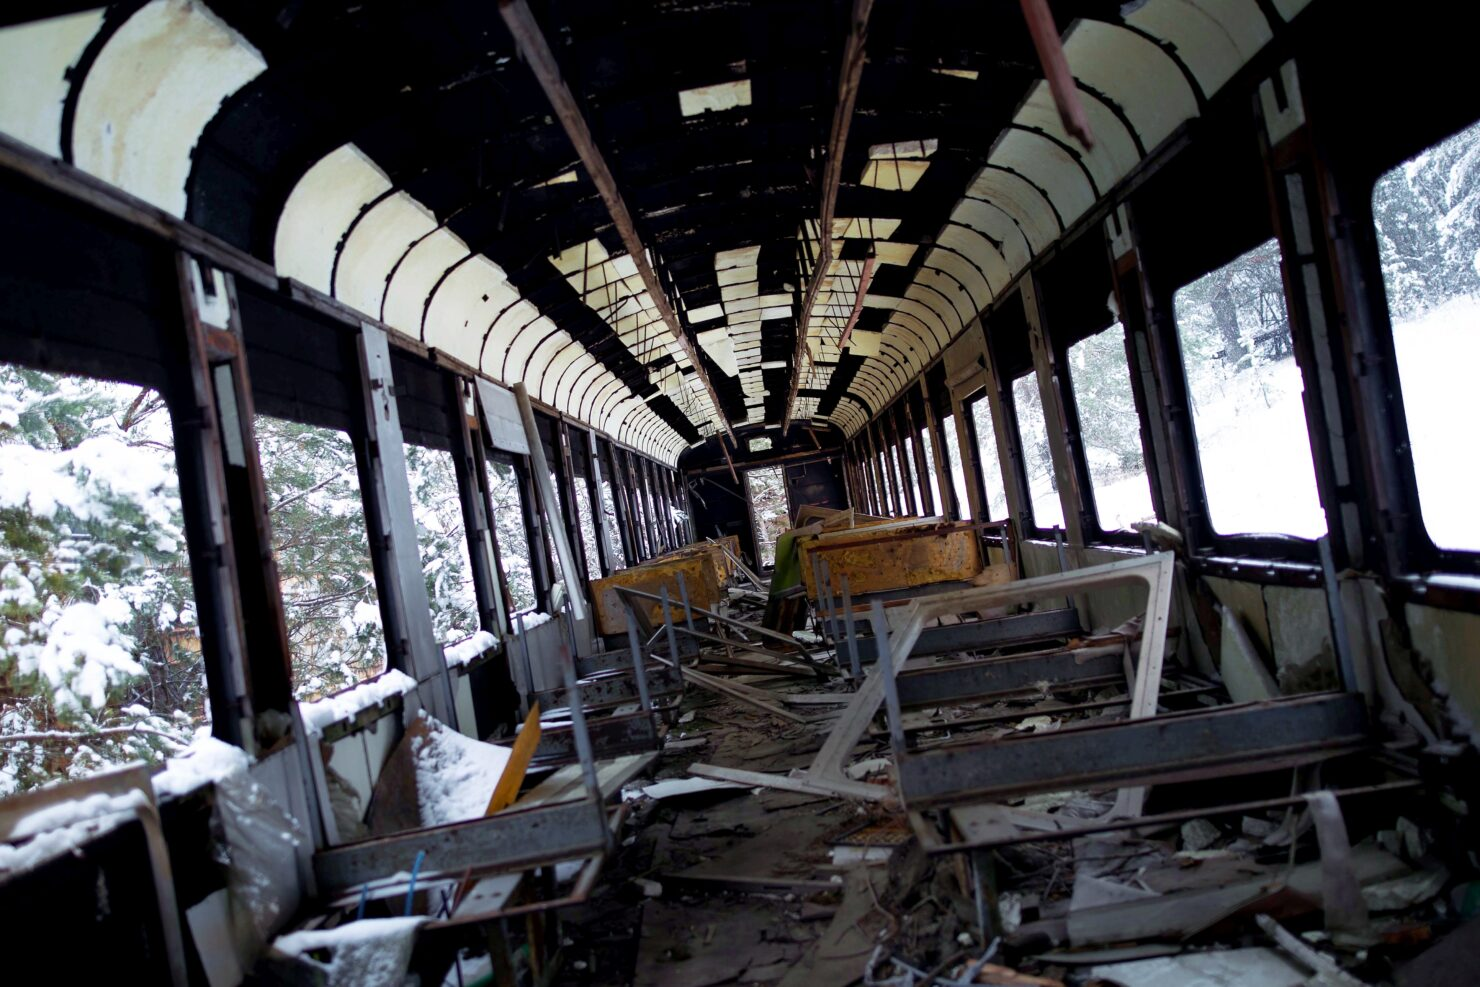 metro-exodus-brought-to-life-02-comparison-subway-chernobyl